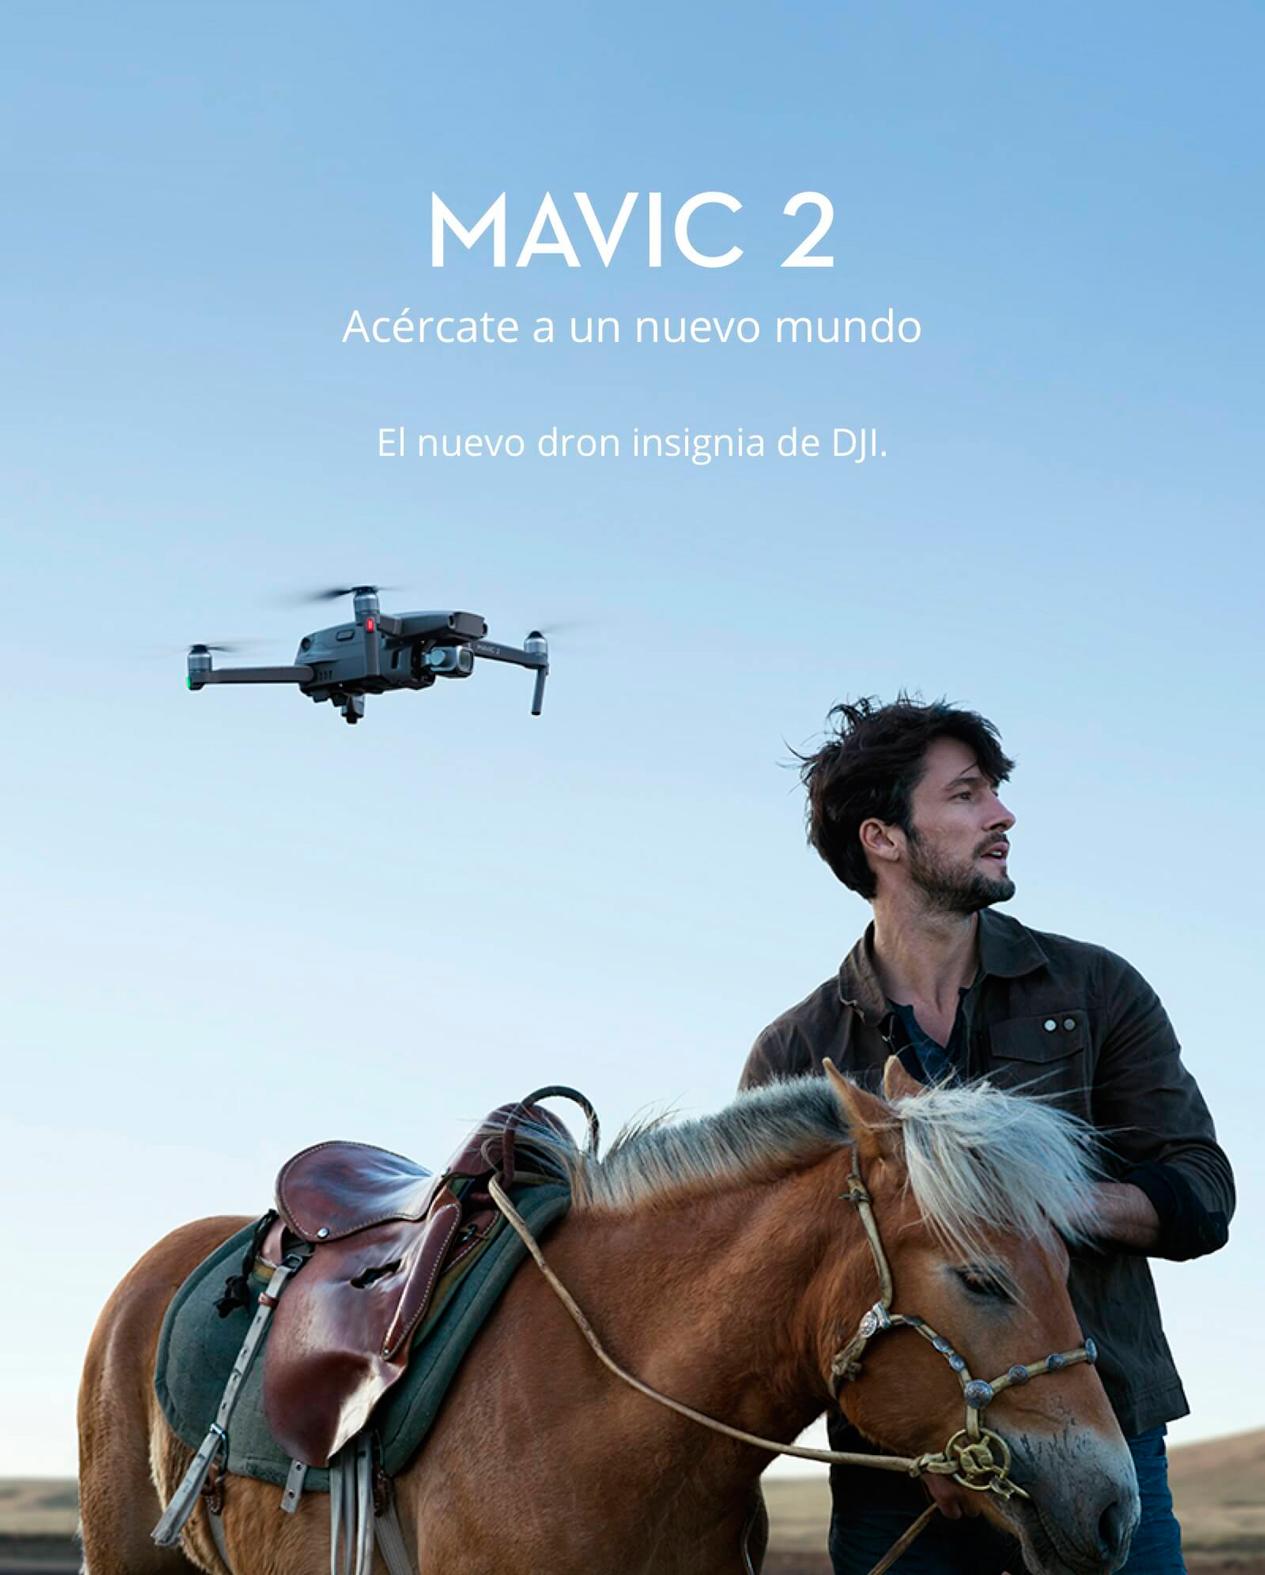 DJI MAVIC 2 PRO - Acércate a un nuevo mundo